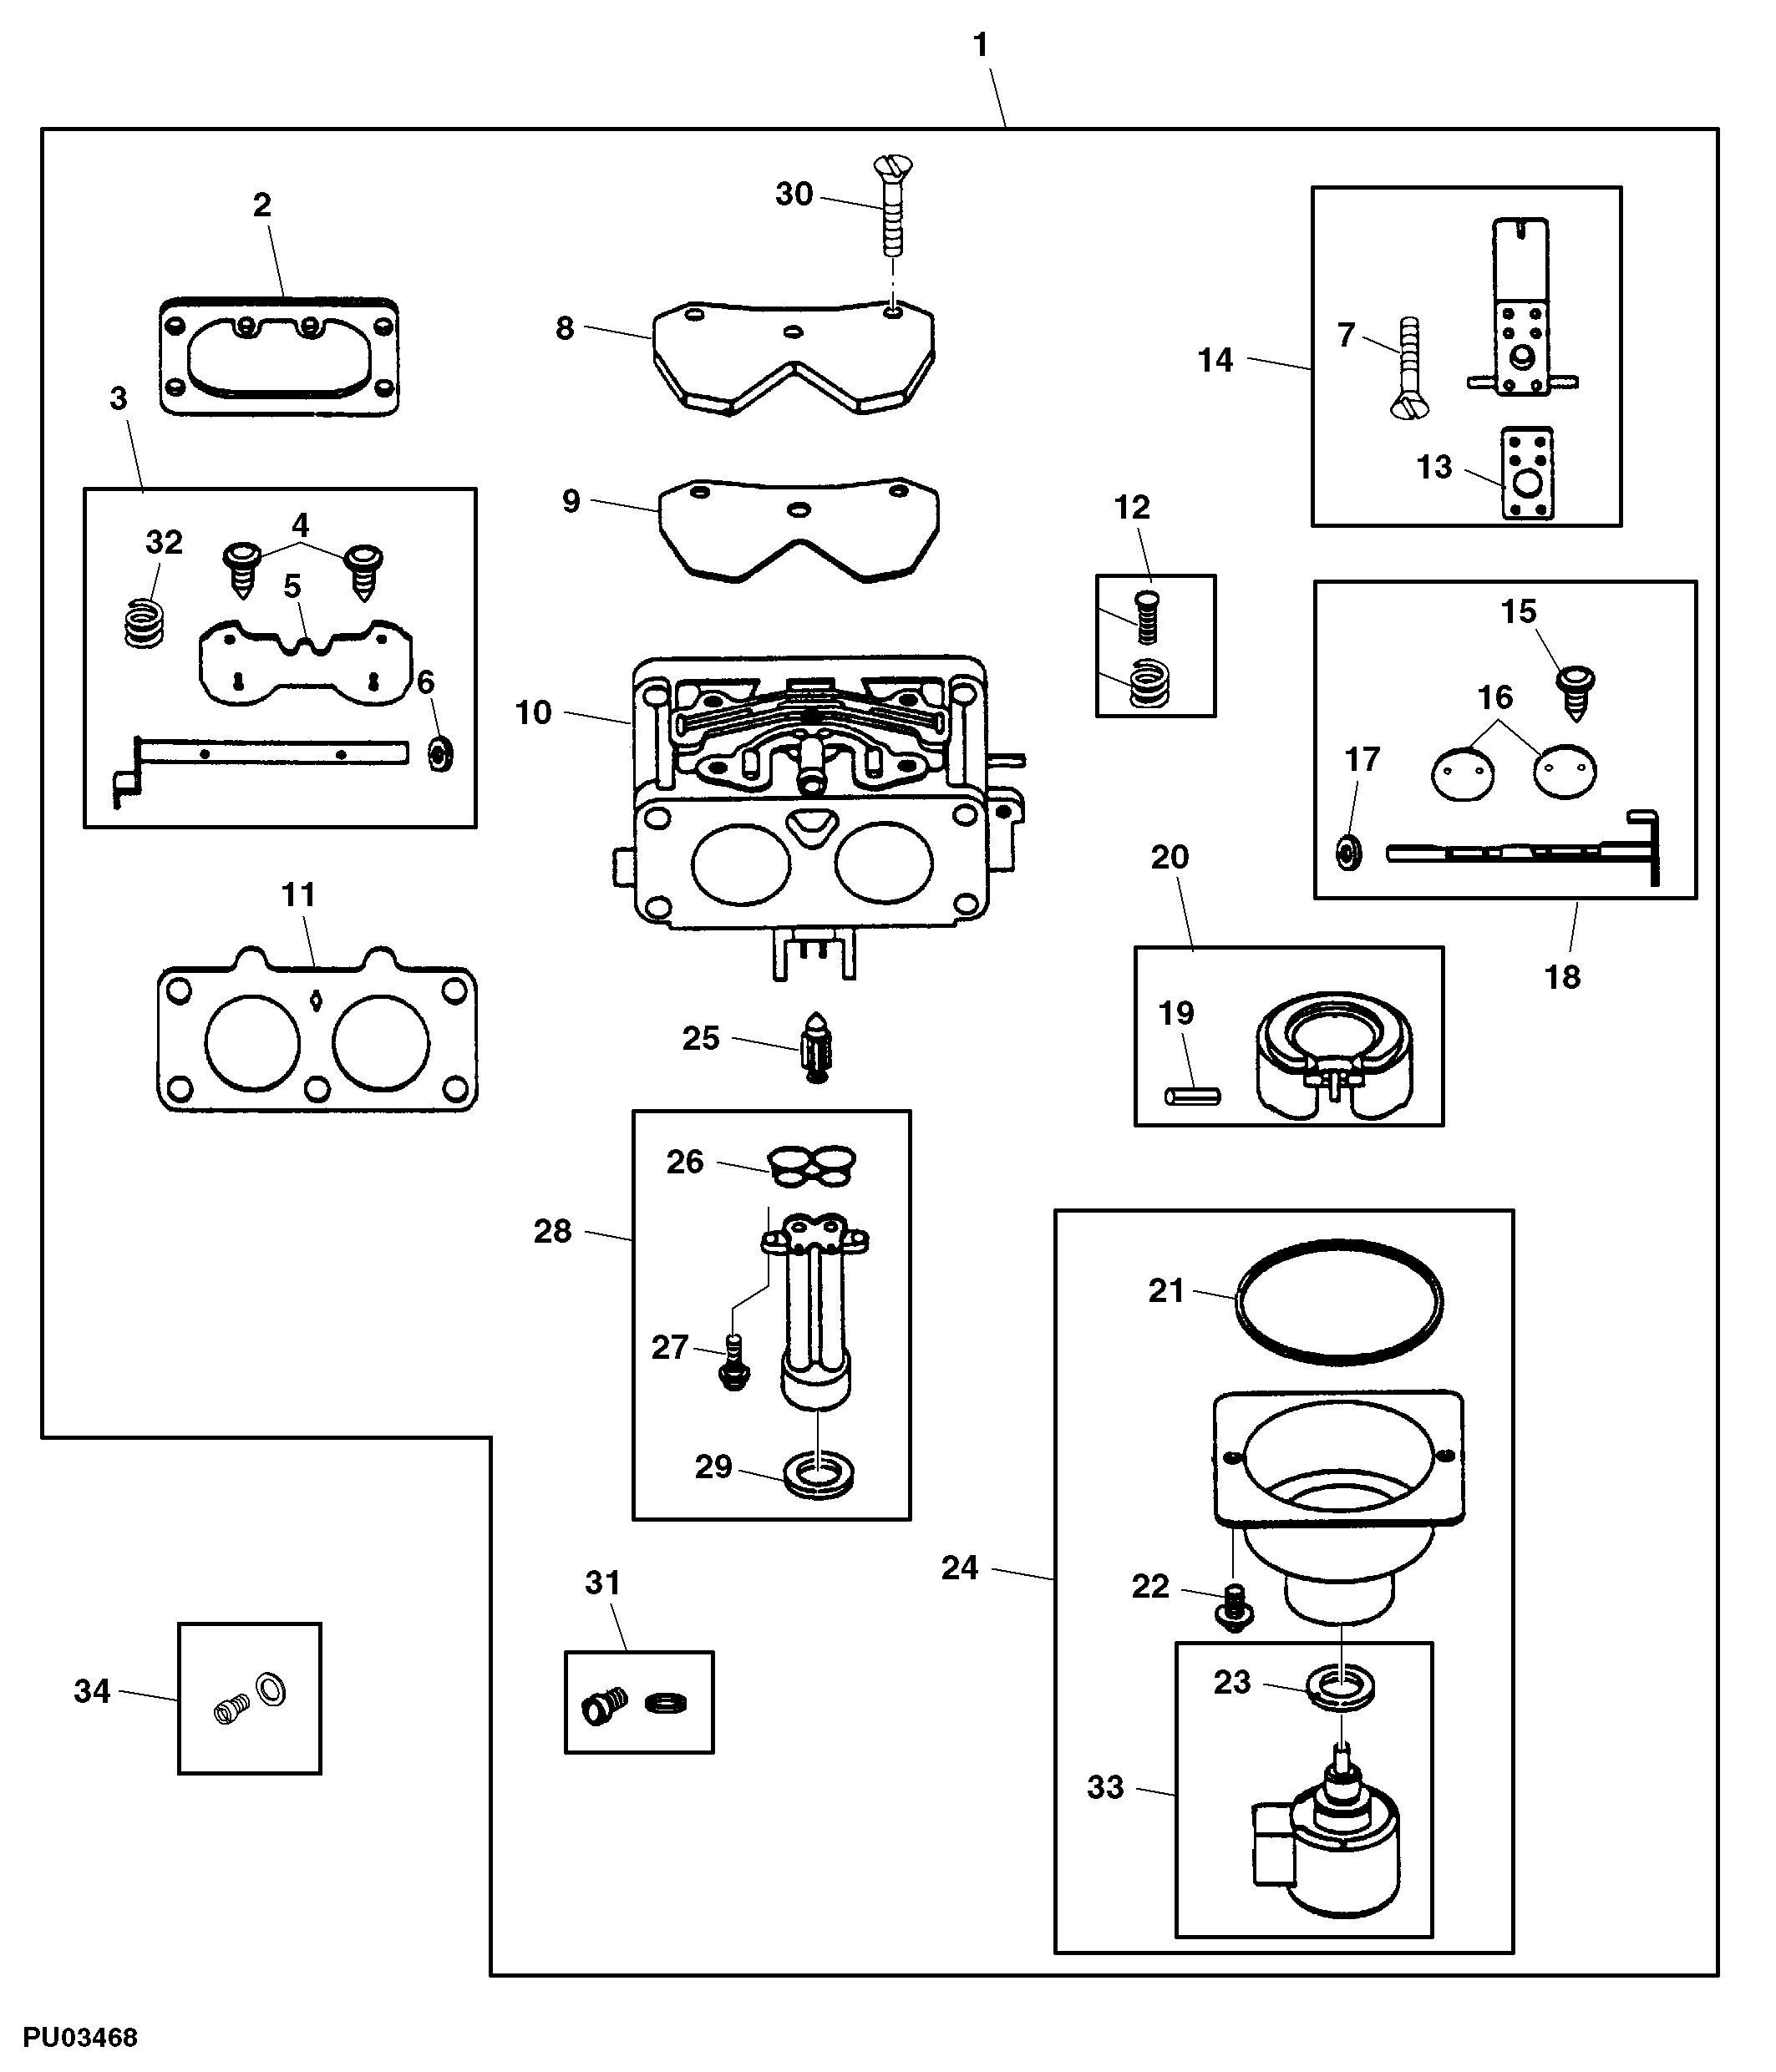 1970 John Deere 110 Wiring Diagram 1970 John Deere 1020